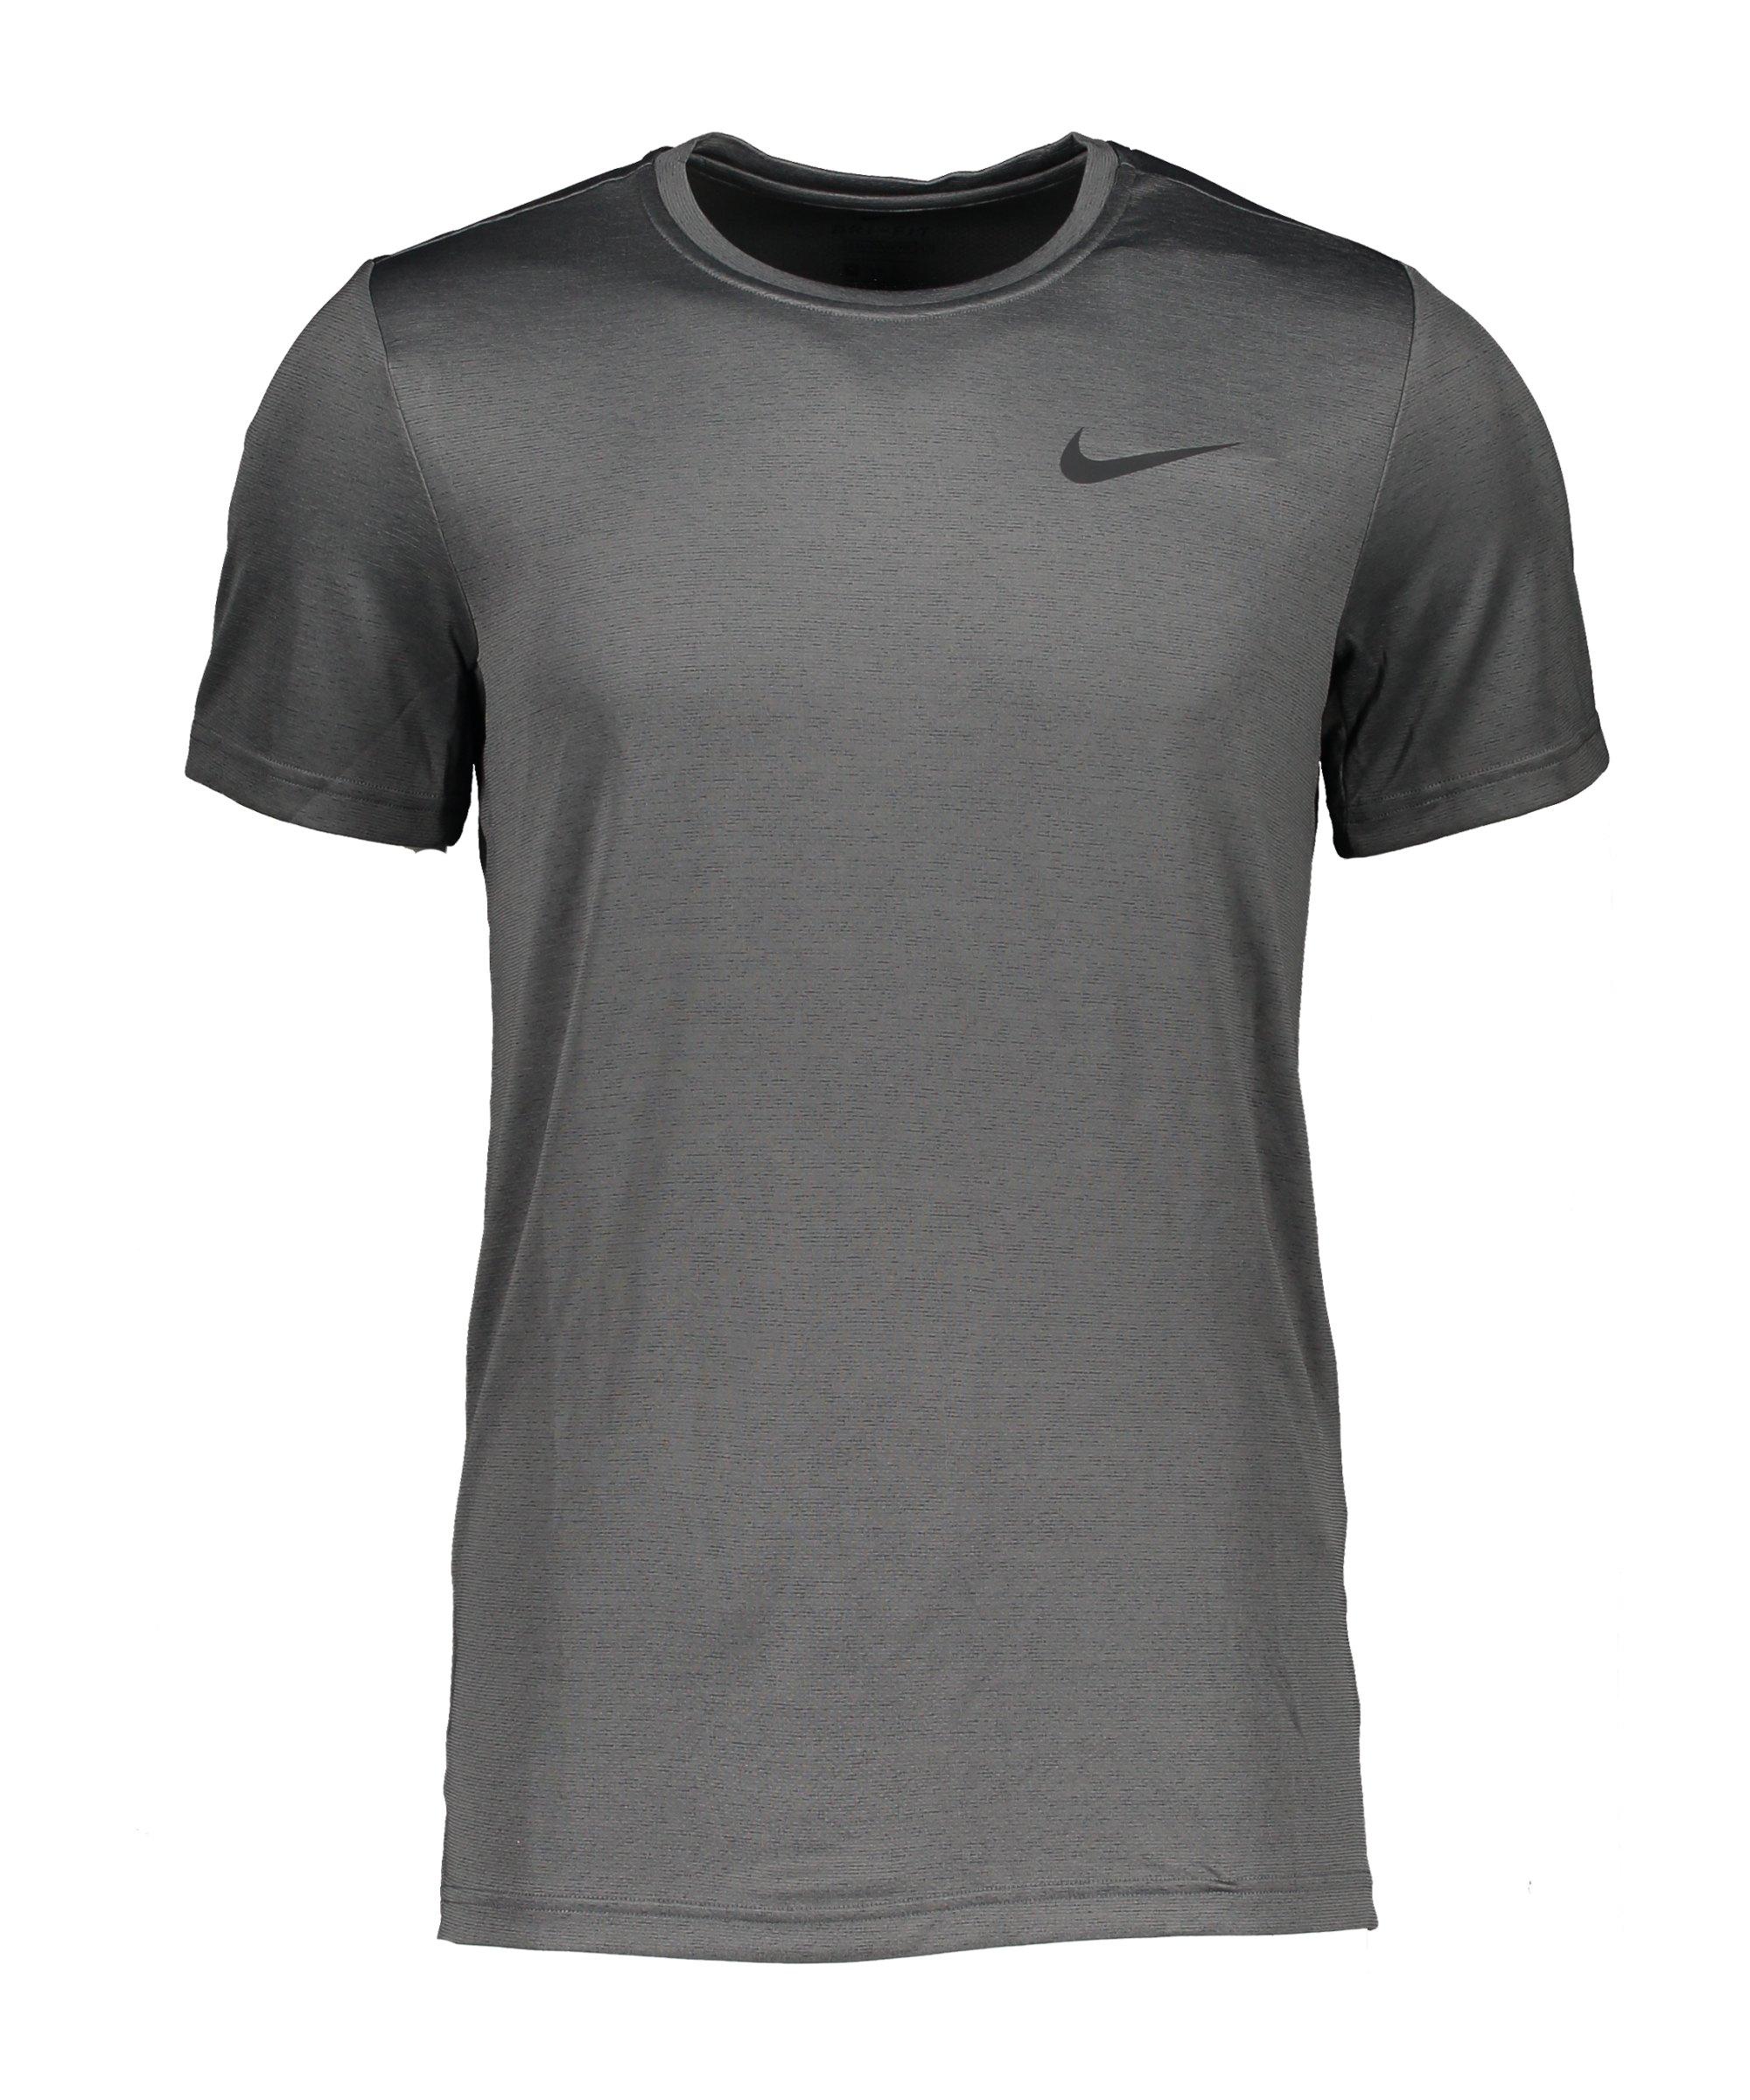 Nike Superset T-Shirt Grau Schwarz F068 - grau